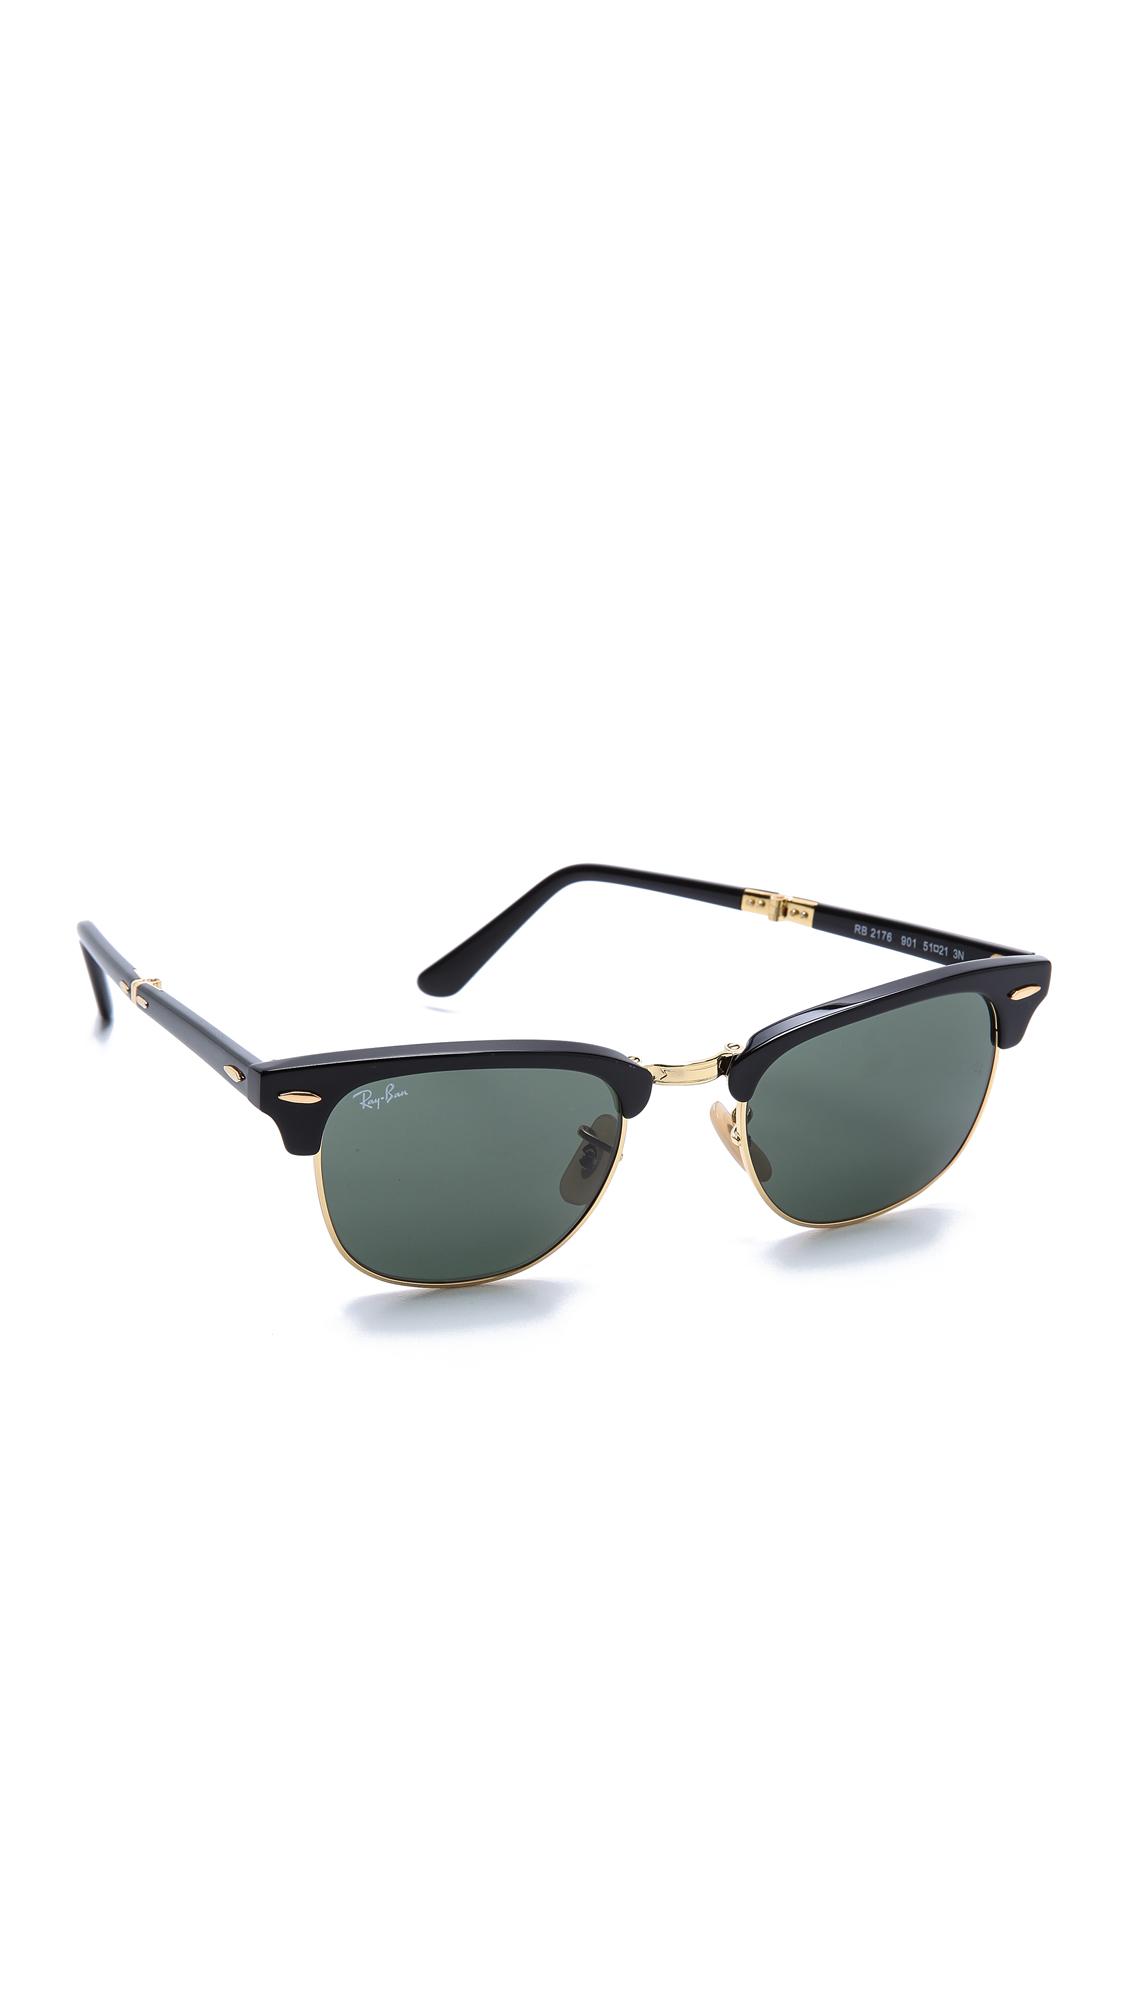 Sunglasses Clubmaster